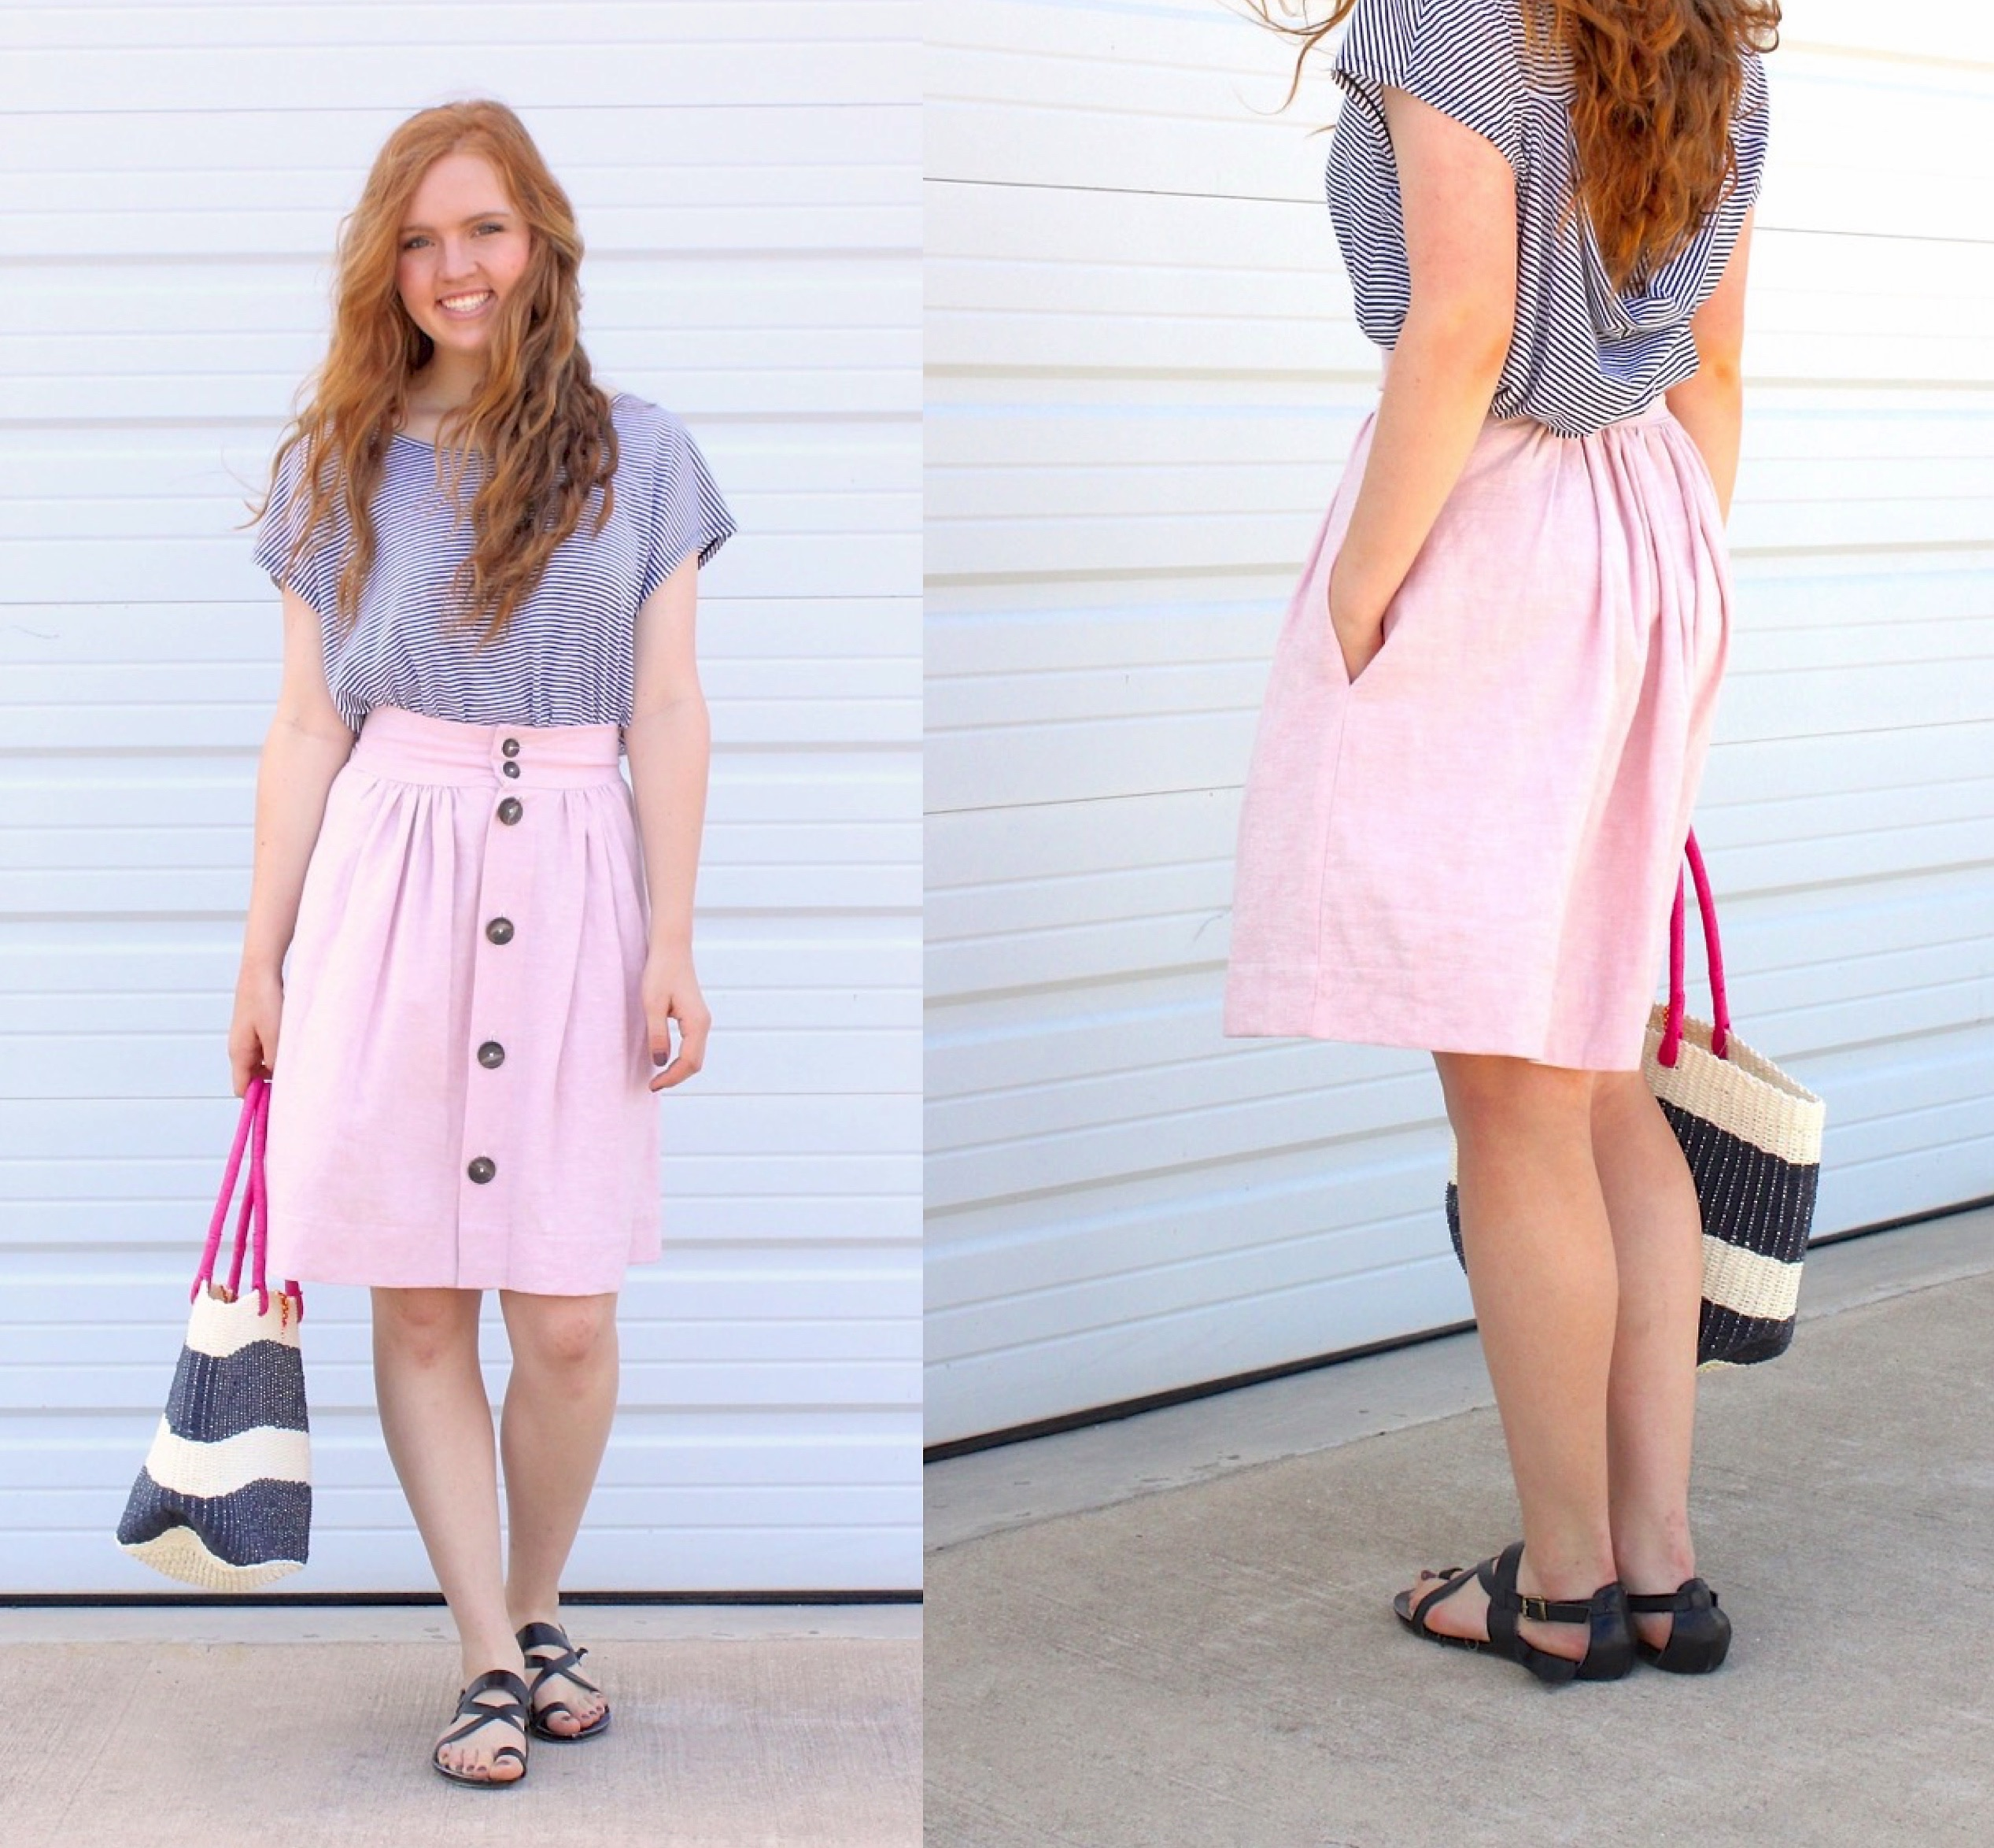 Long Skirts for Teenage Girls